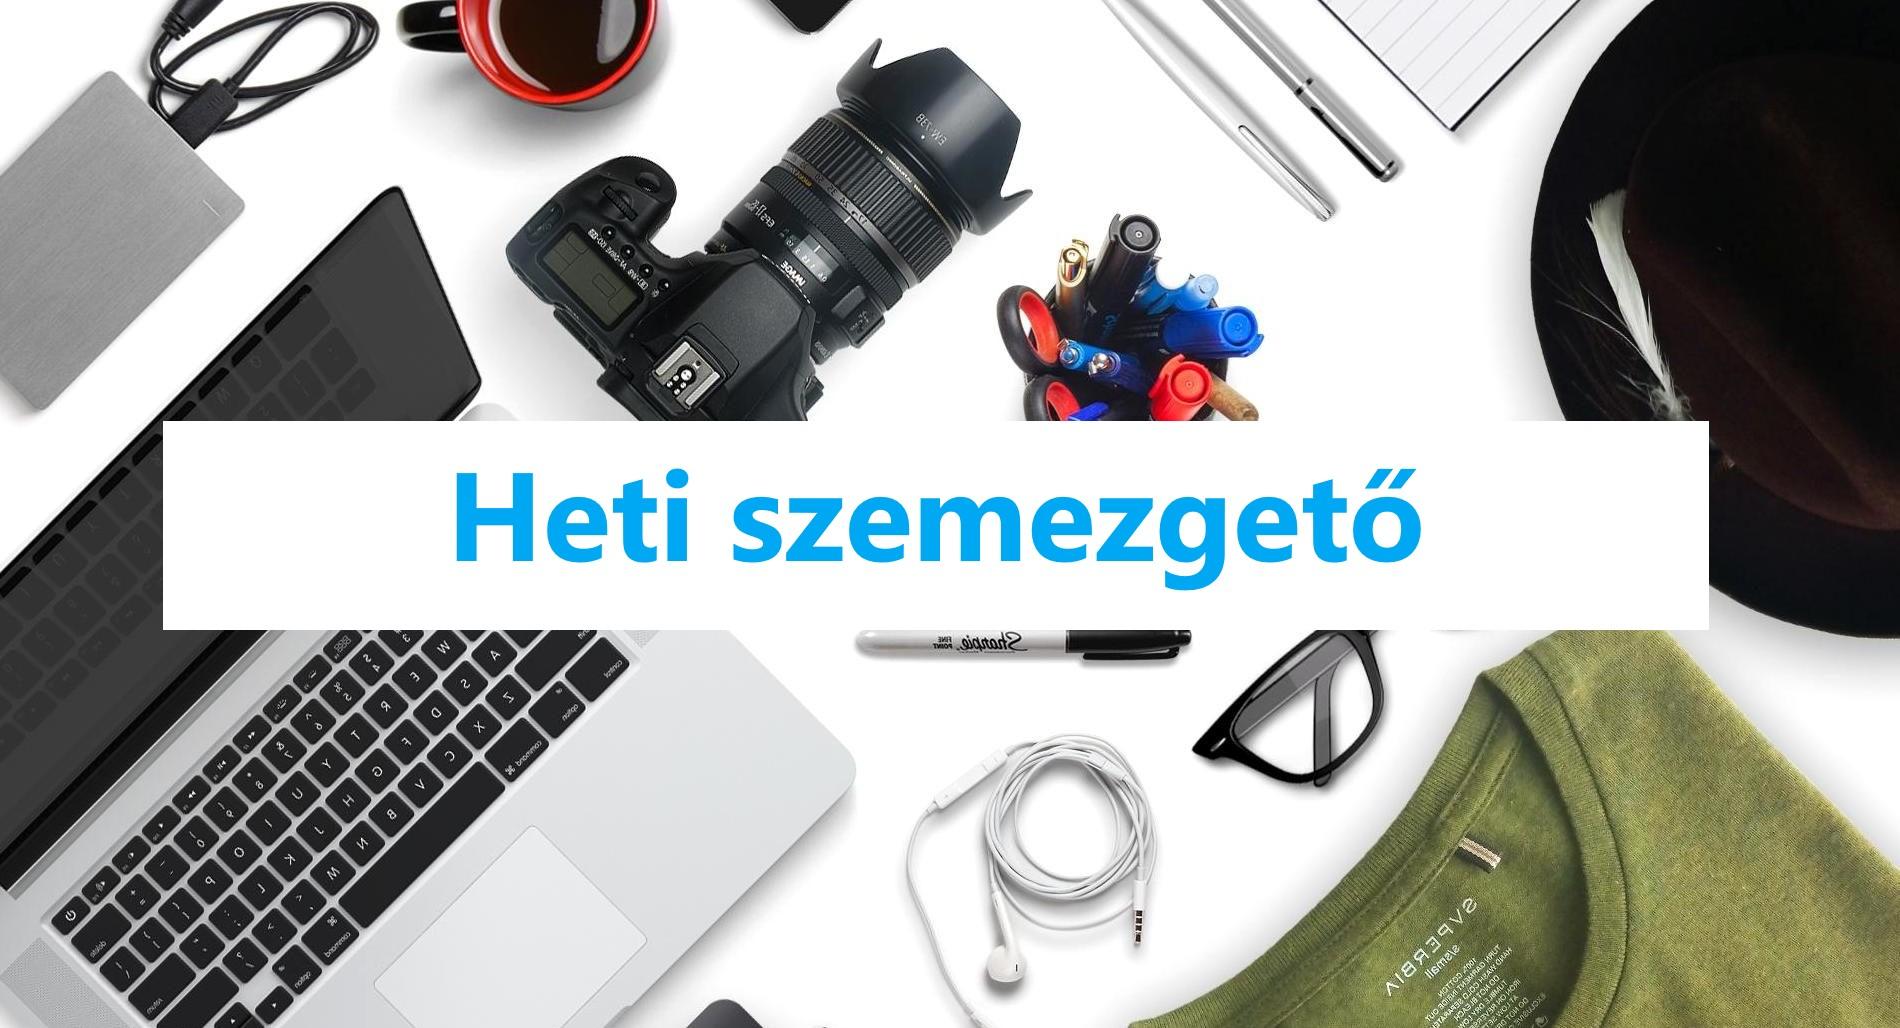 heti_szemezgeto_uj_61.jpg